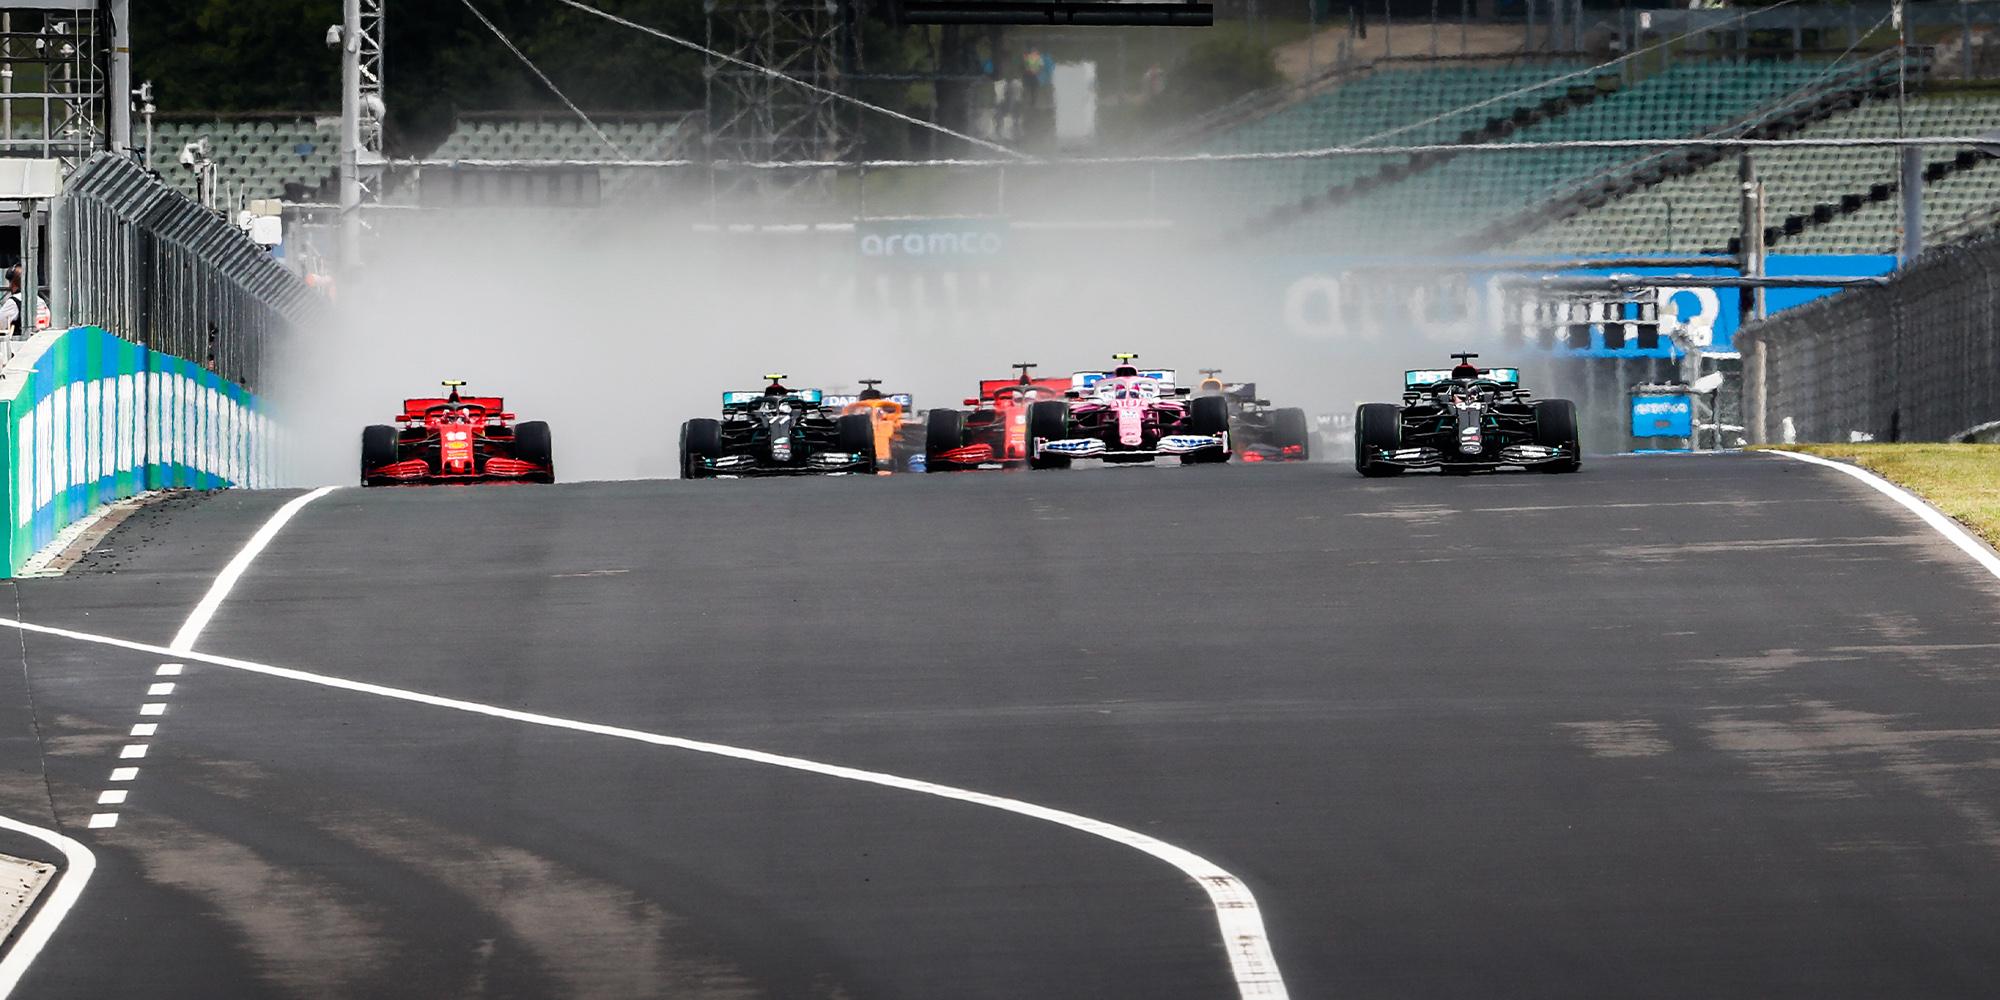 2020 F1 Hungarian Grand Prix start